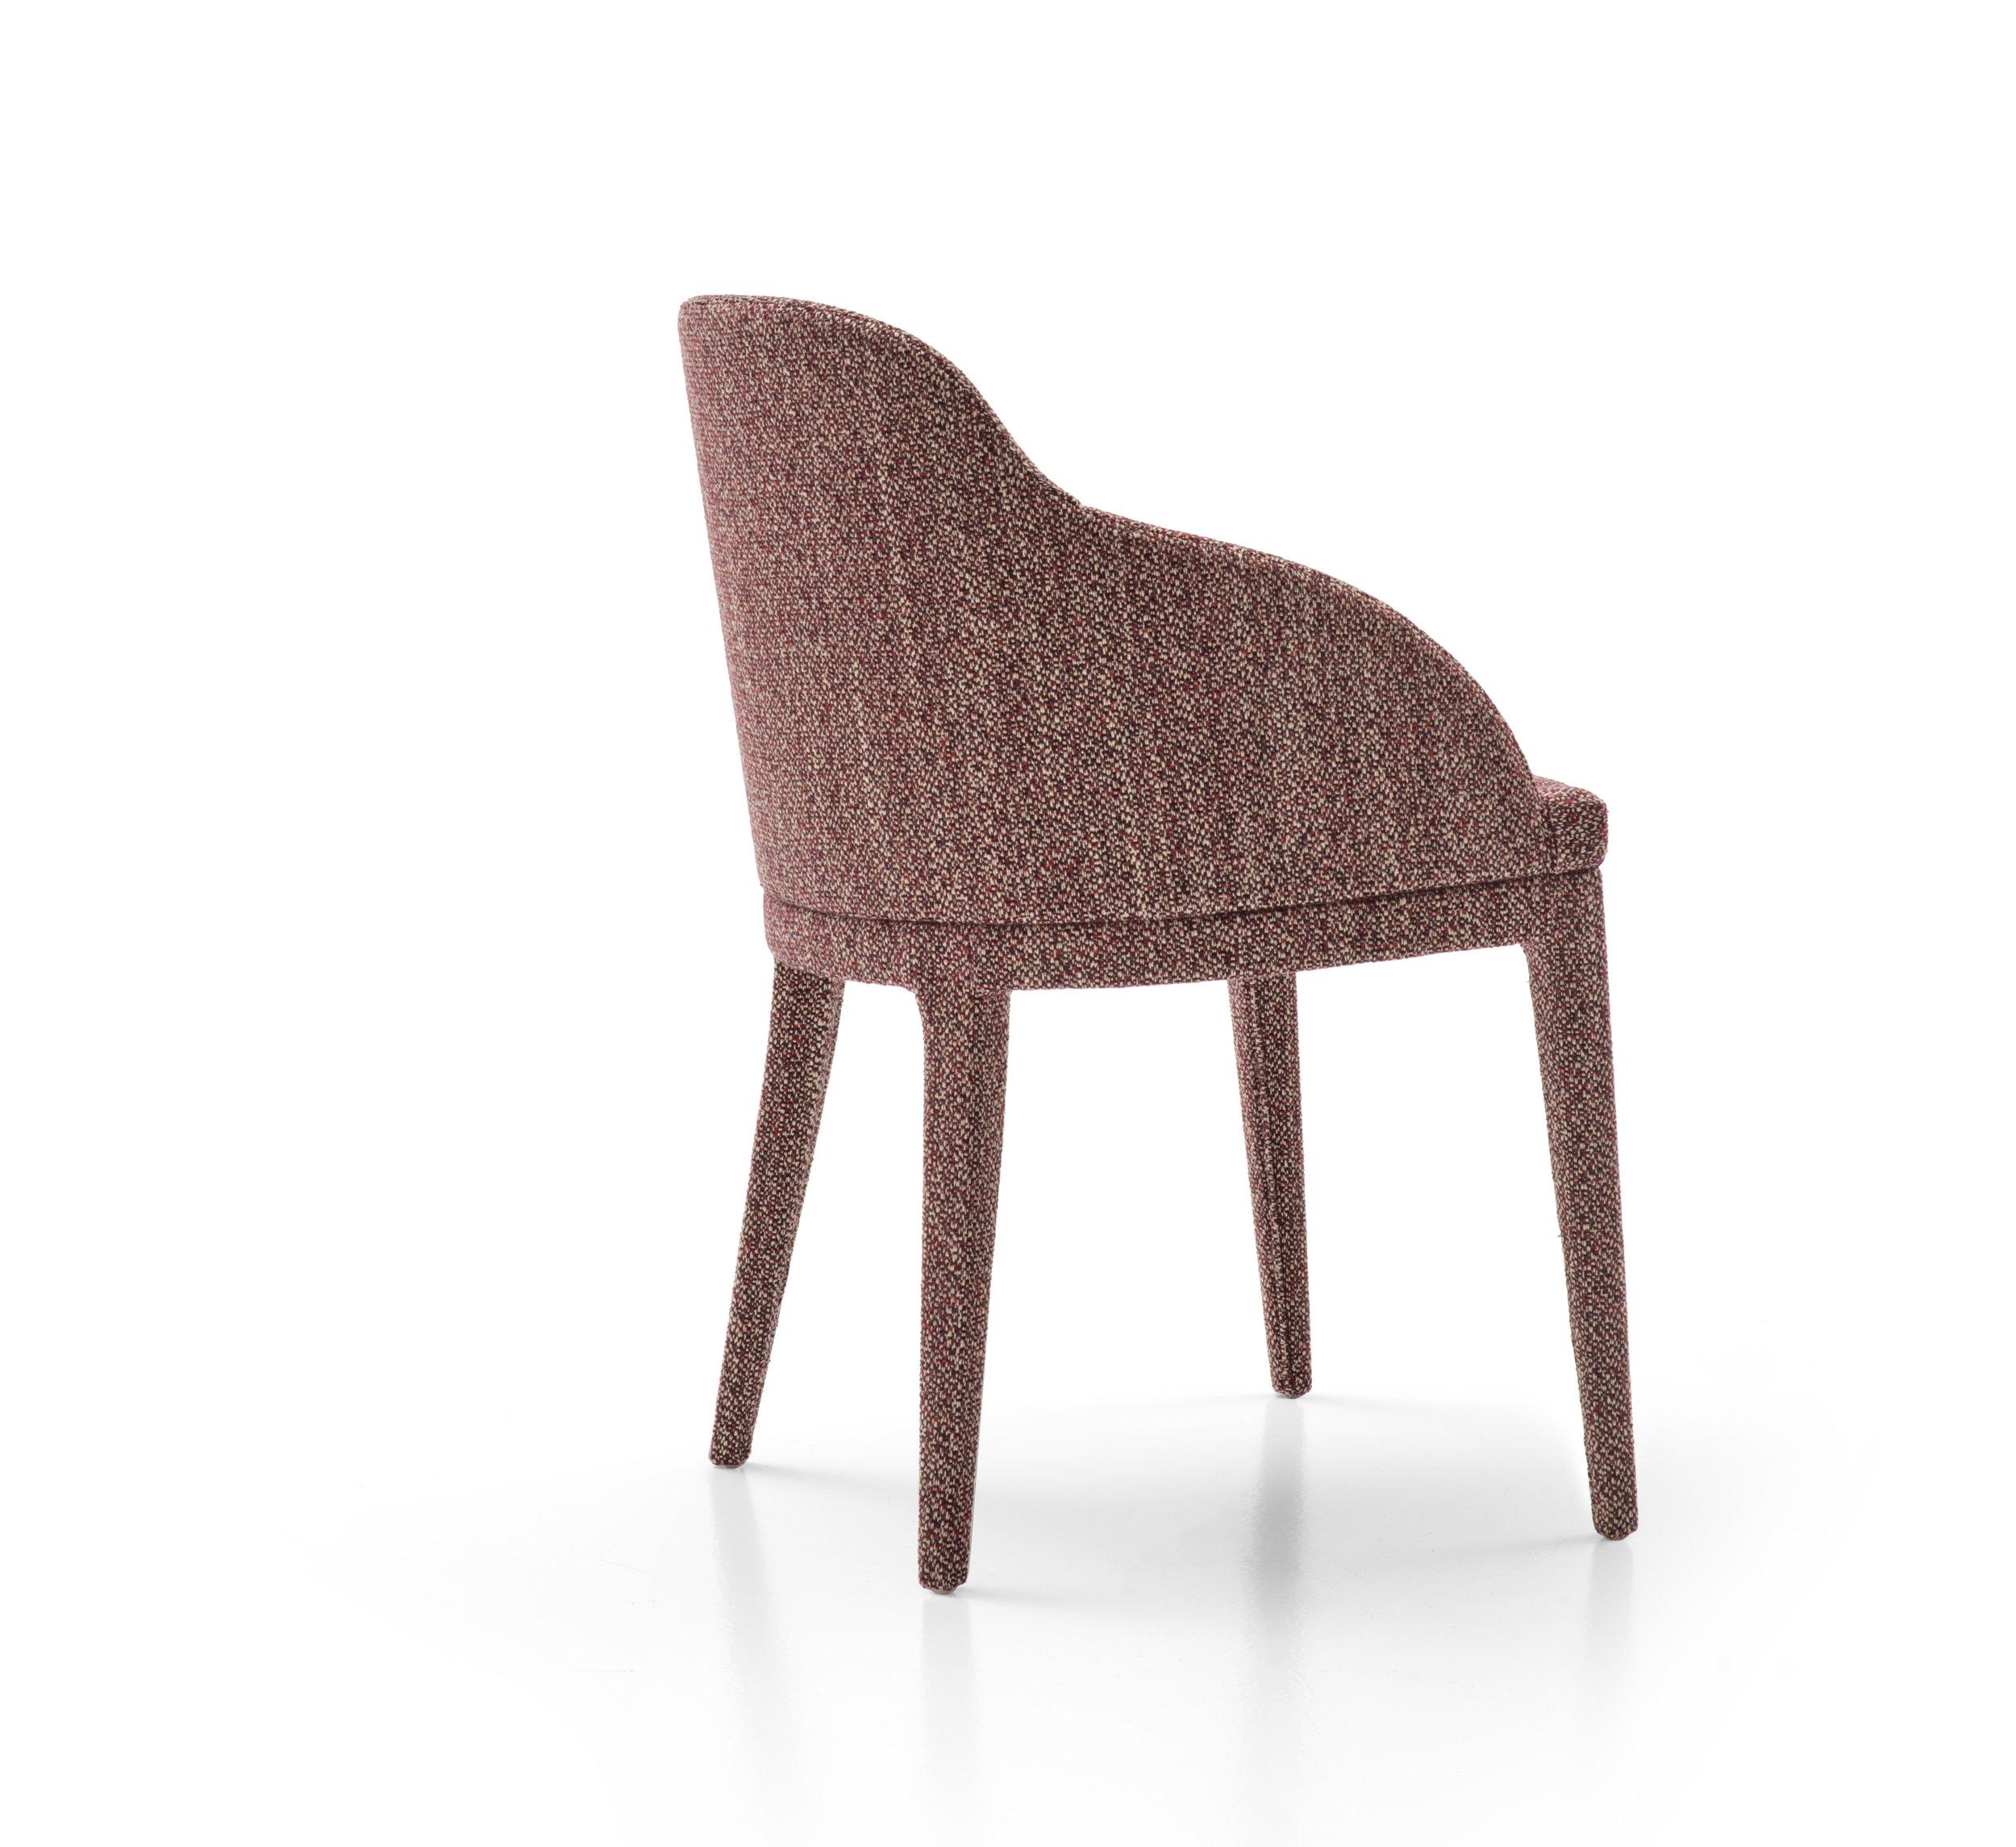 MDC 122 Modern Italian Dining Chair